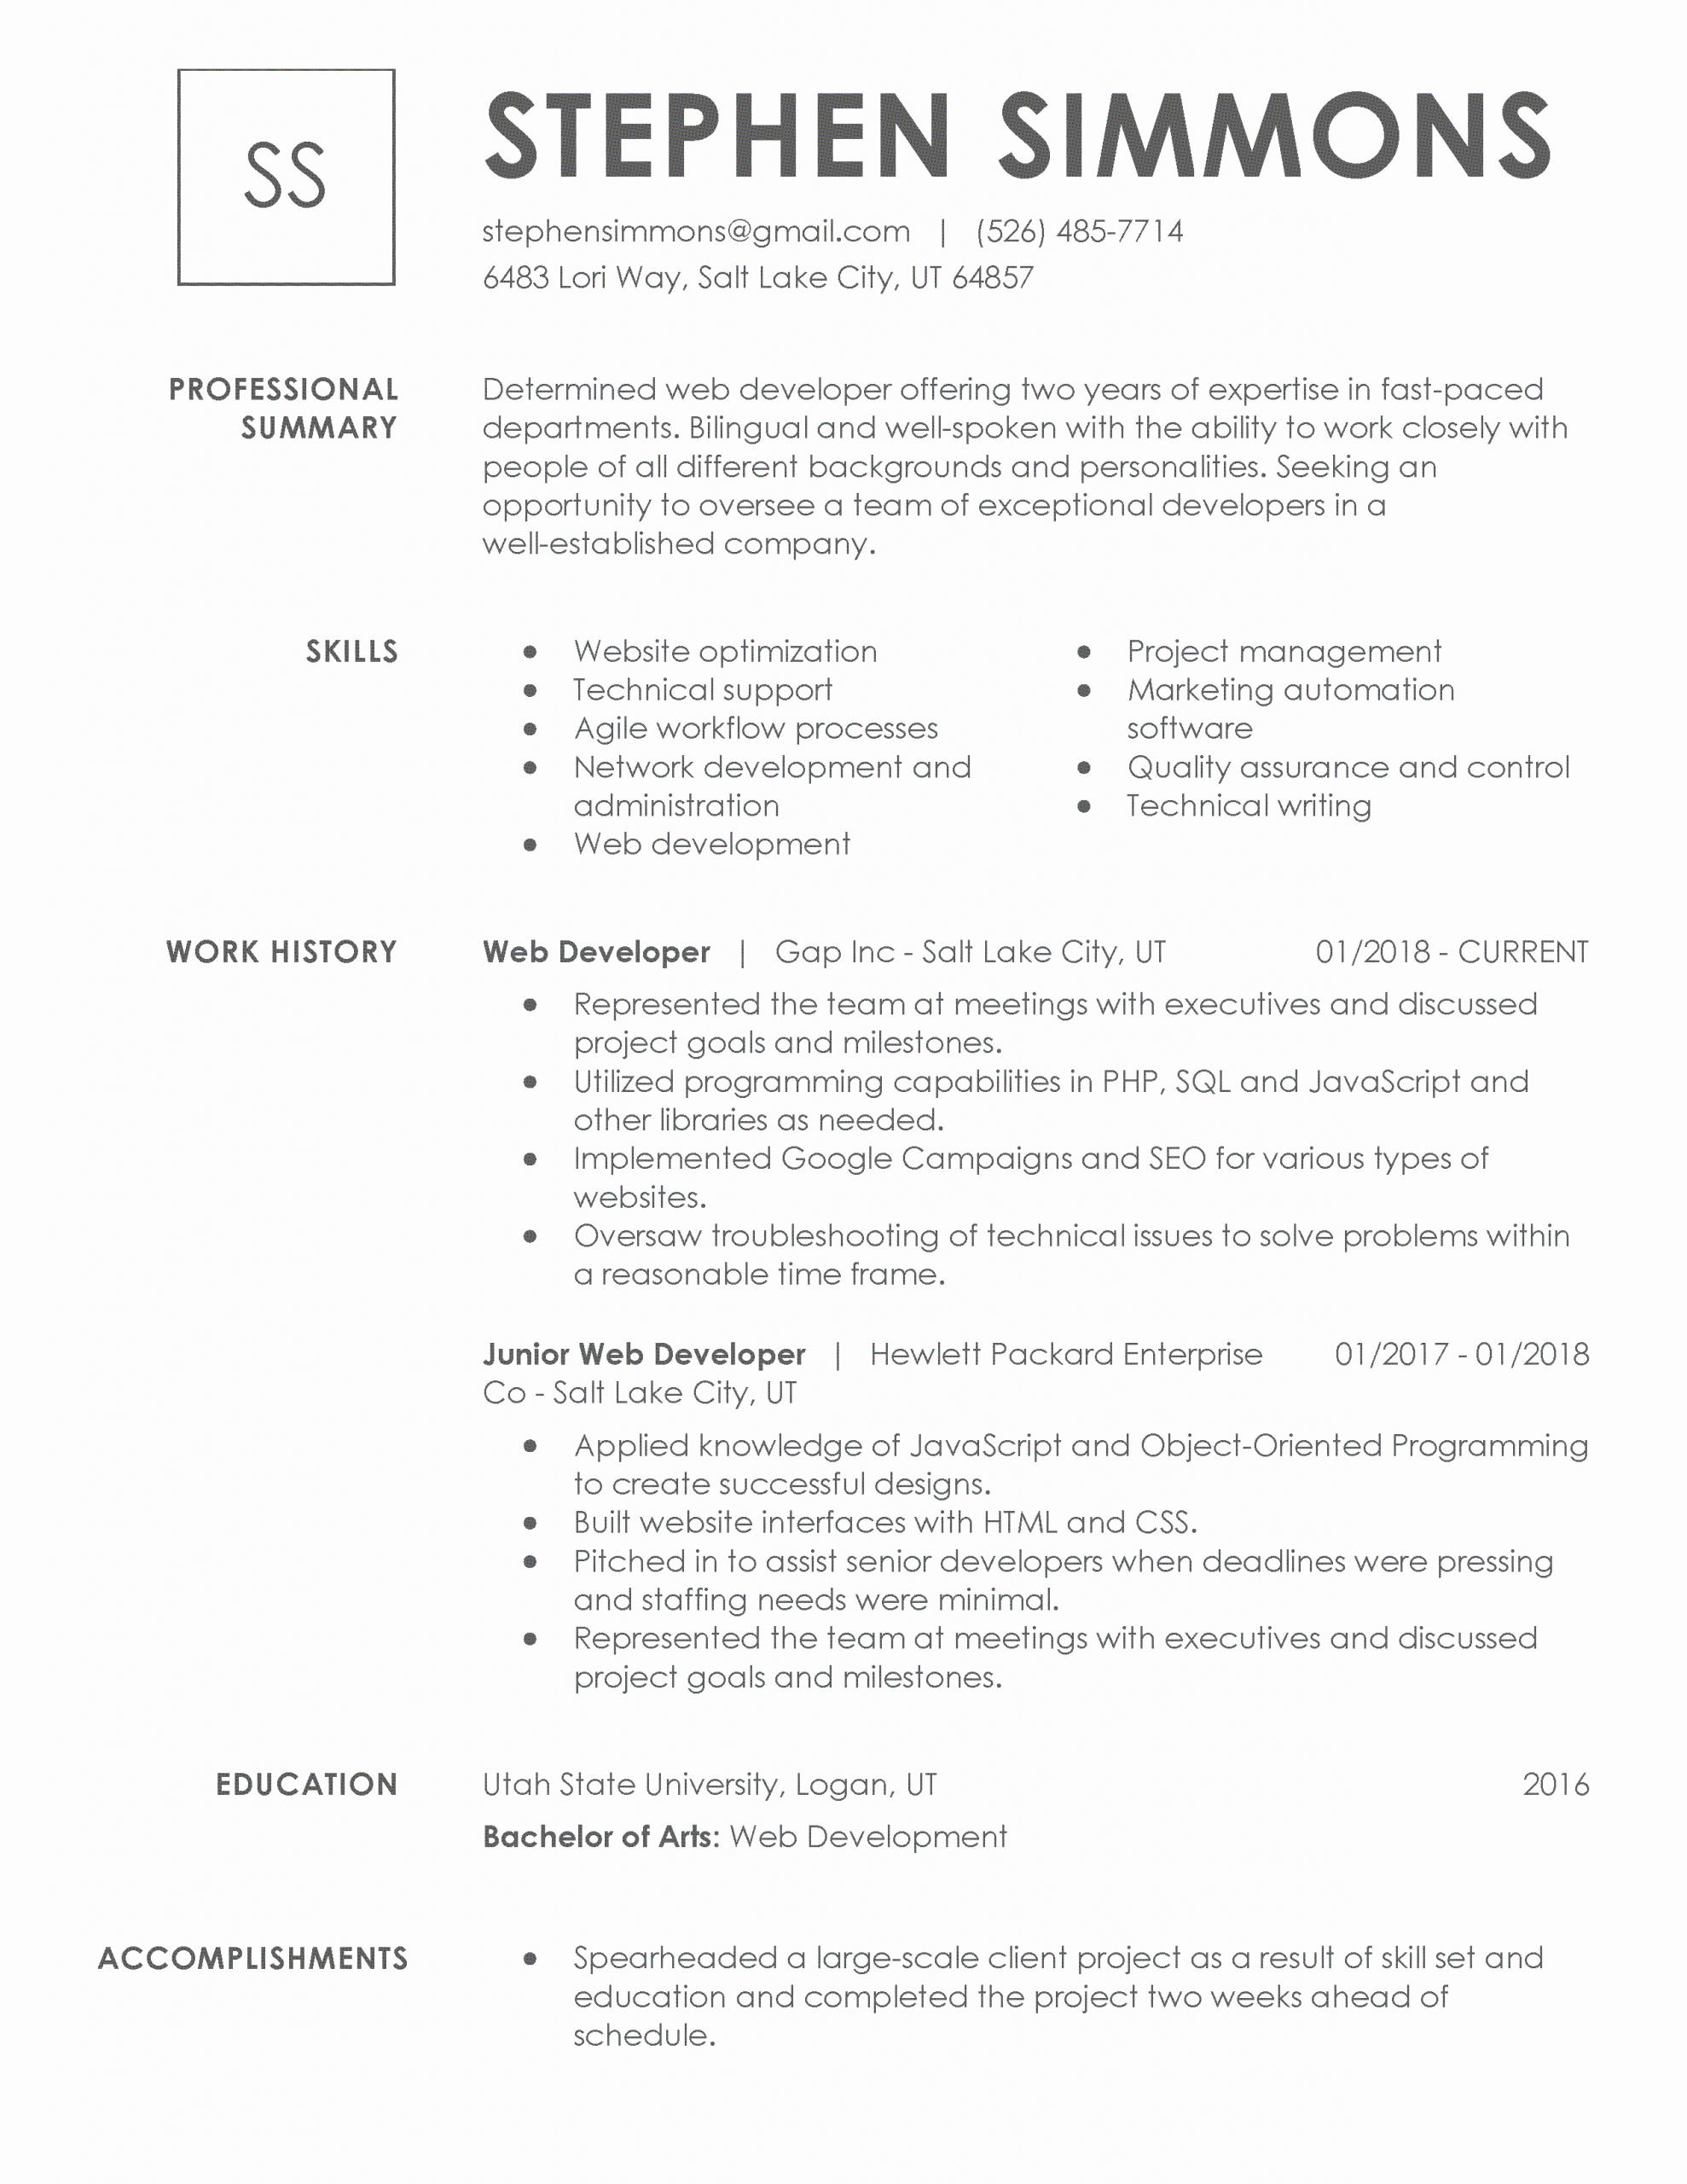 resume title must be unique